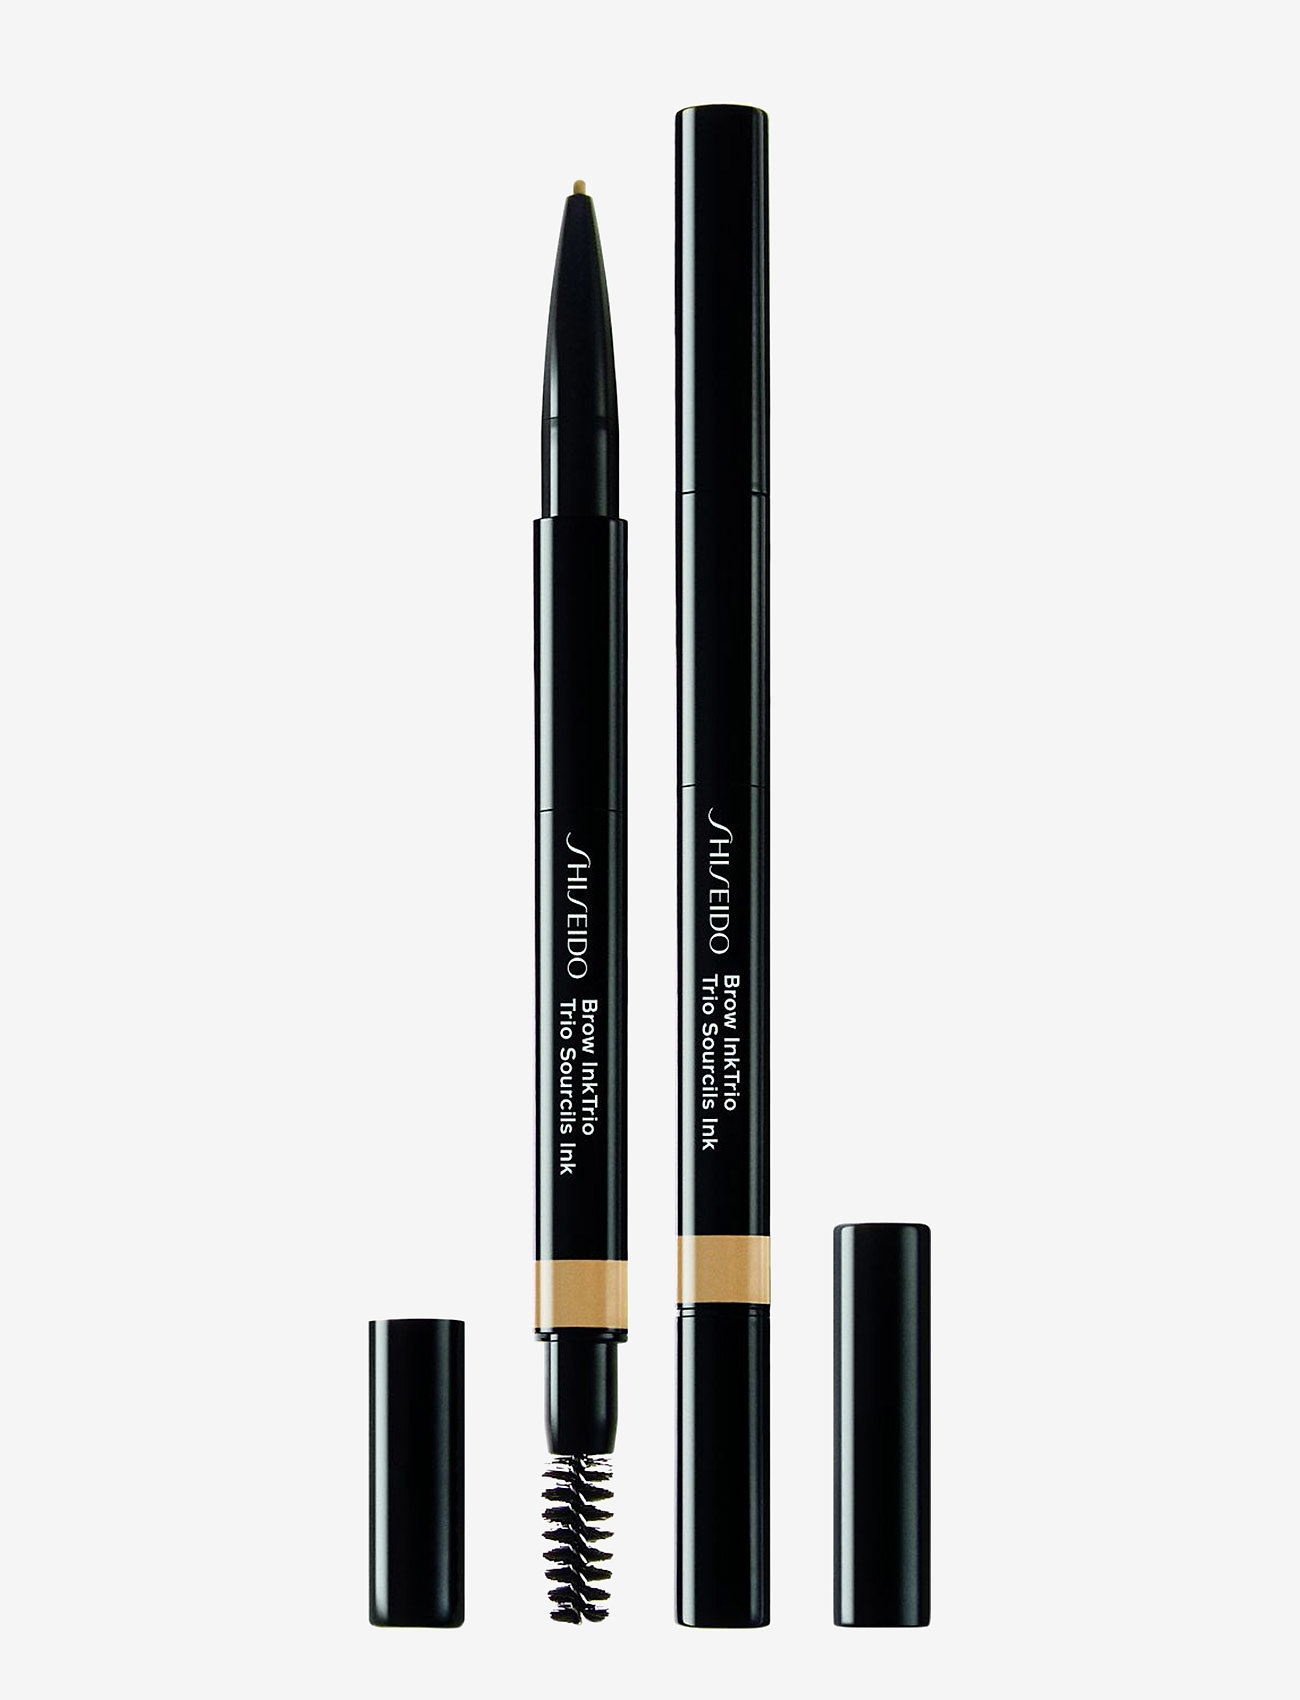 Shiseido - BROWTRIO INK 01 BLONDE - Øjenbrynsblyant - 01 blonde - 0